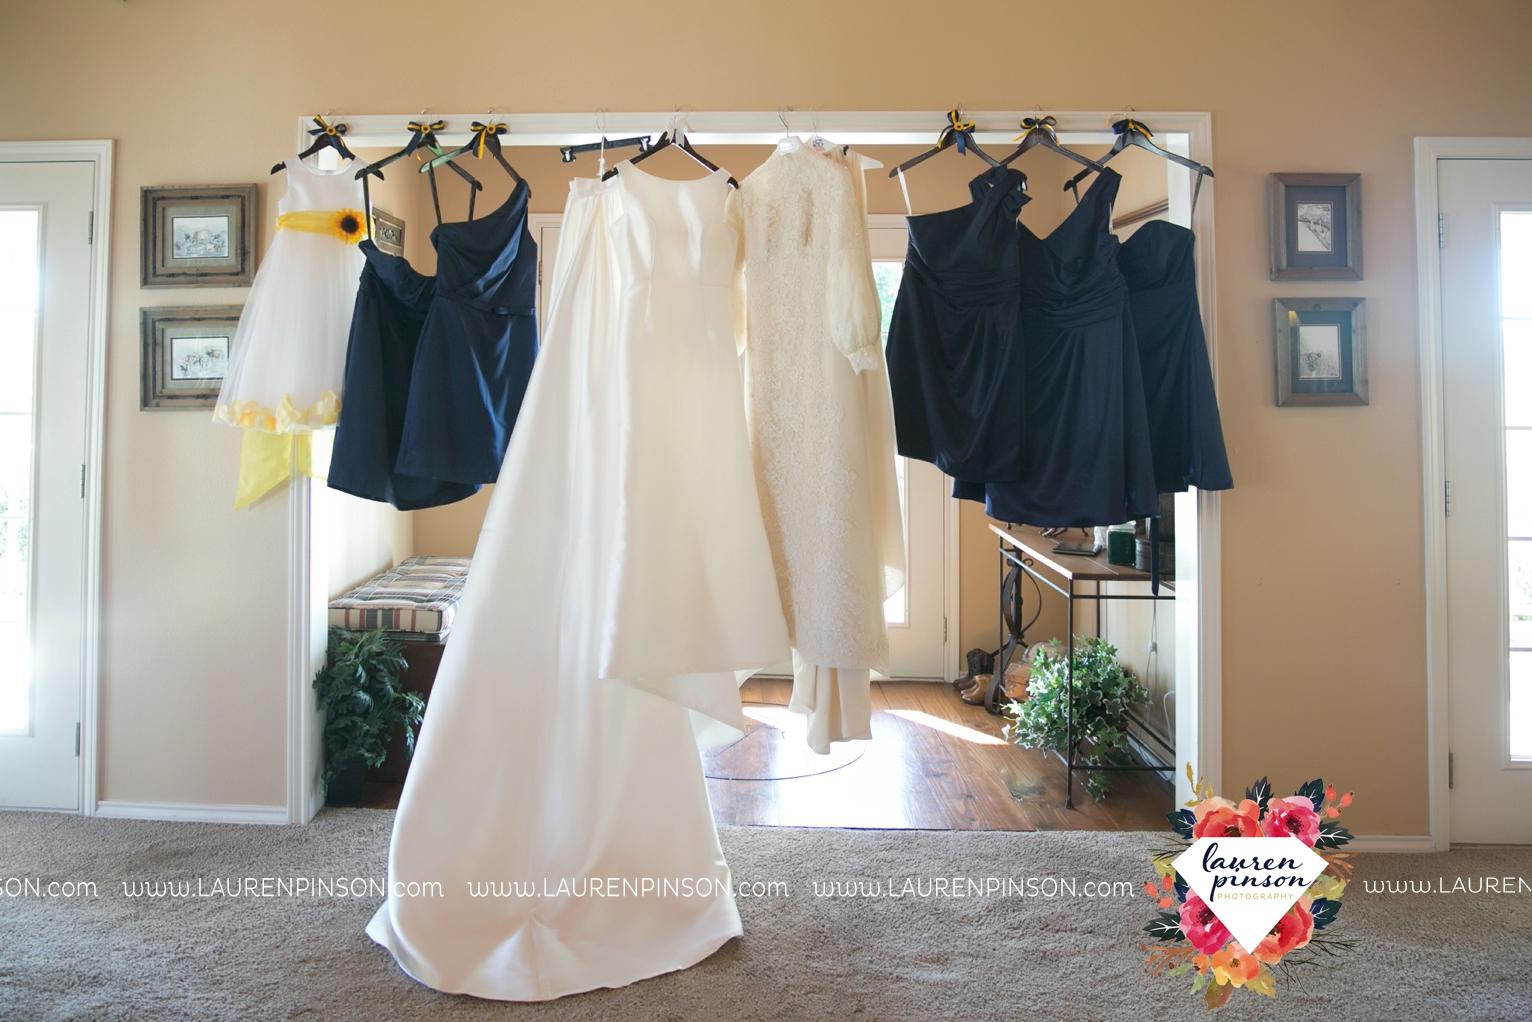 bells-texas-wedding-photography-at-willowood-ranch-chapel-north-texas-wichita-falls-wedding-photographer_1817.jpg